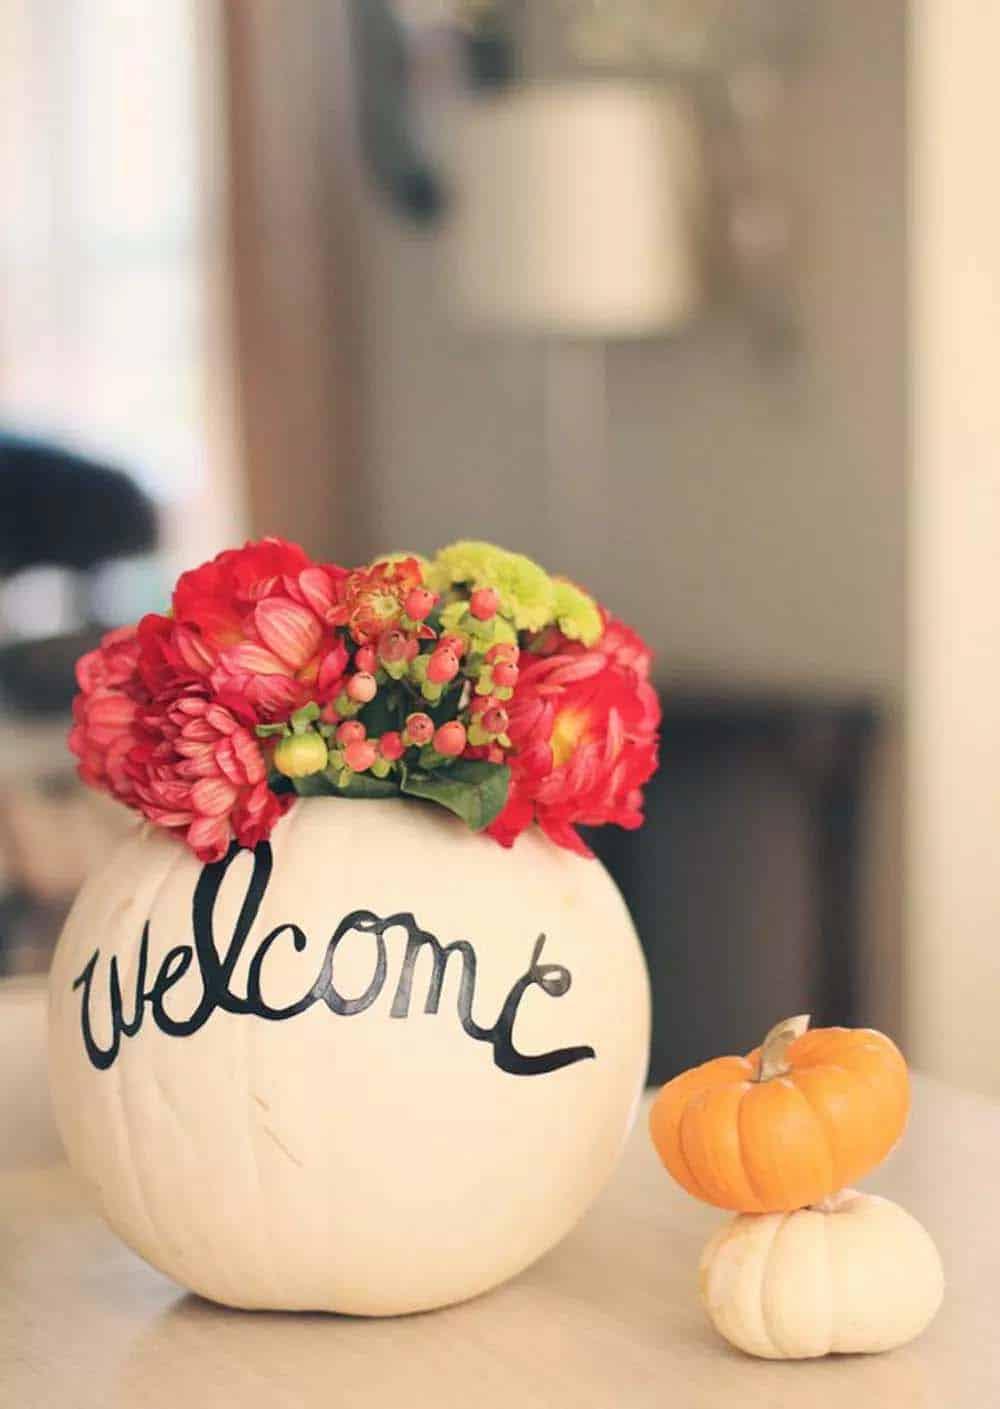 welcome-pumpkin-flowers